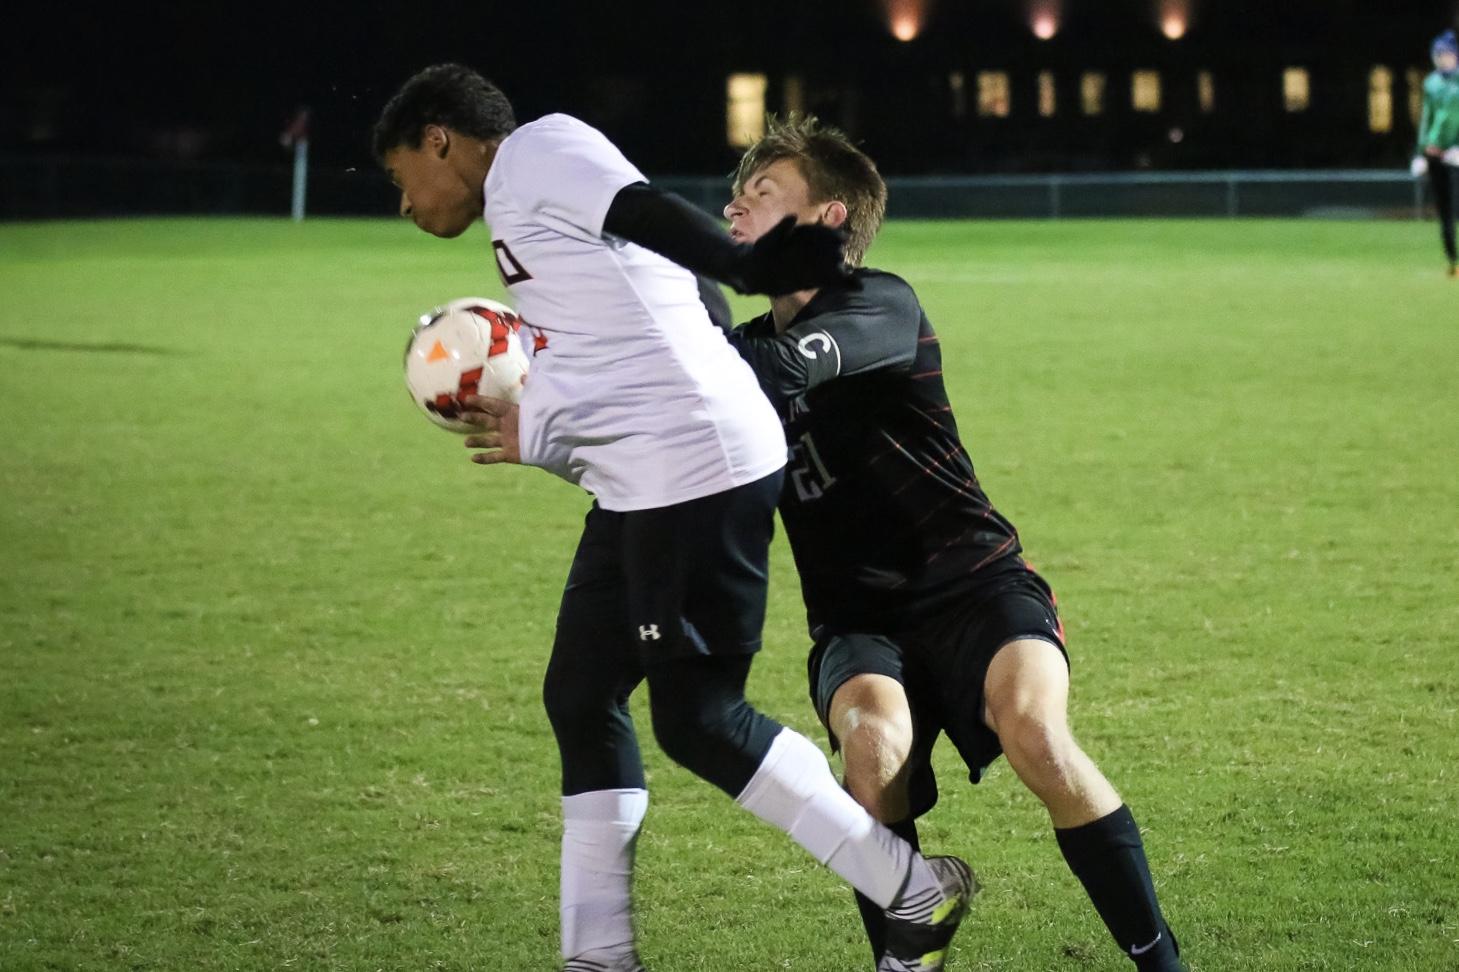 Photos: Varsity Soccer Vs Ozark